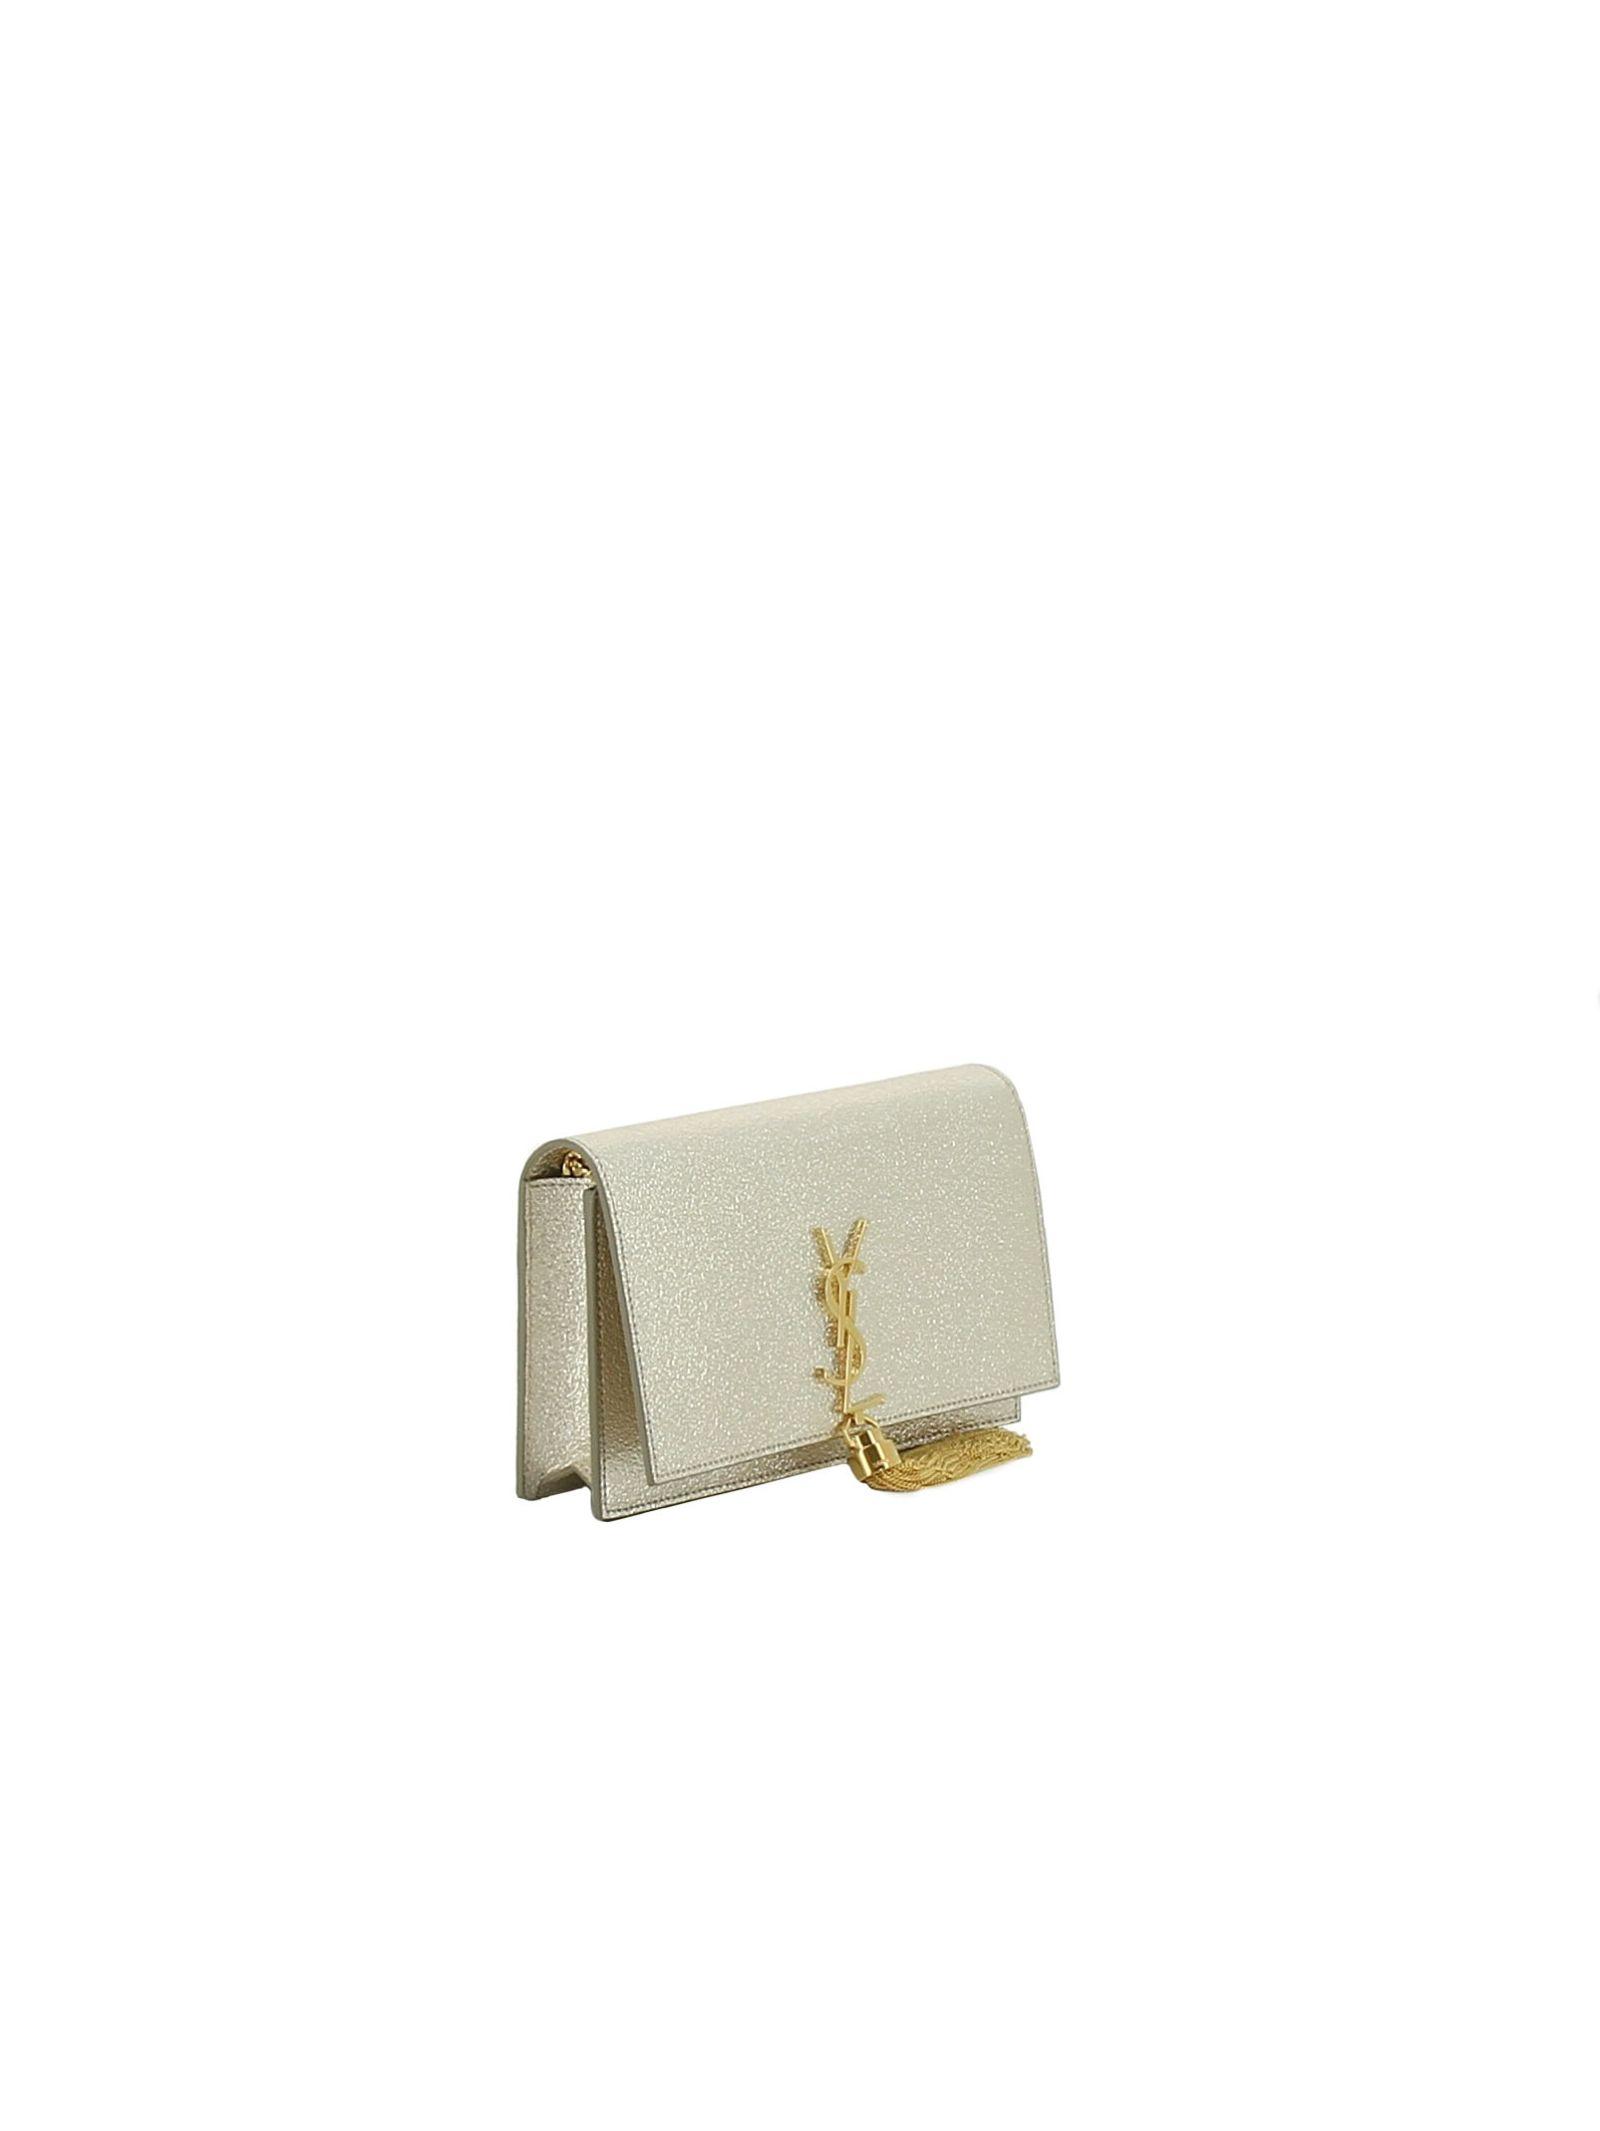 ... Saint Laurent Classic Kate Monogram Tassel Chain Wallet - Silver ... c5737ef363